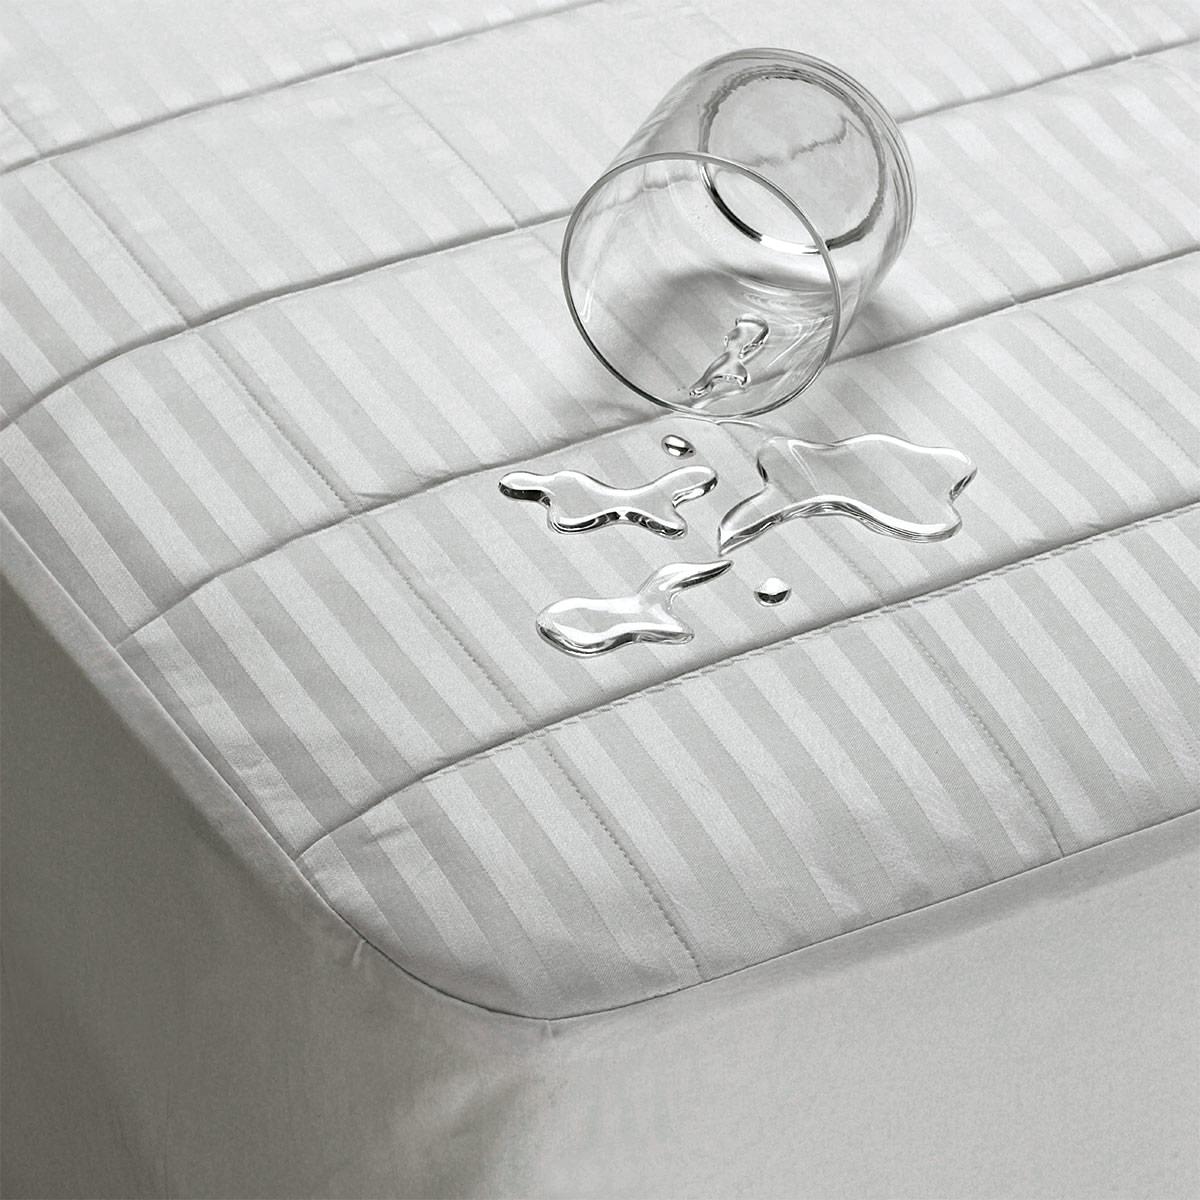 Waterproof & Washable Mattress Pad. Waterproof_MatPad1.jpg